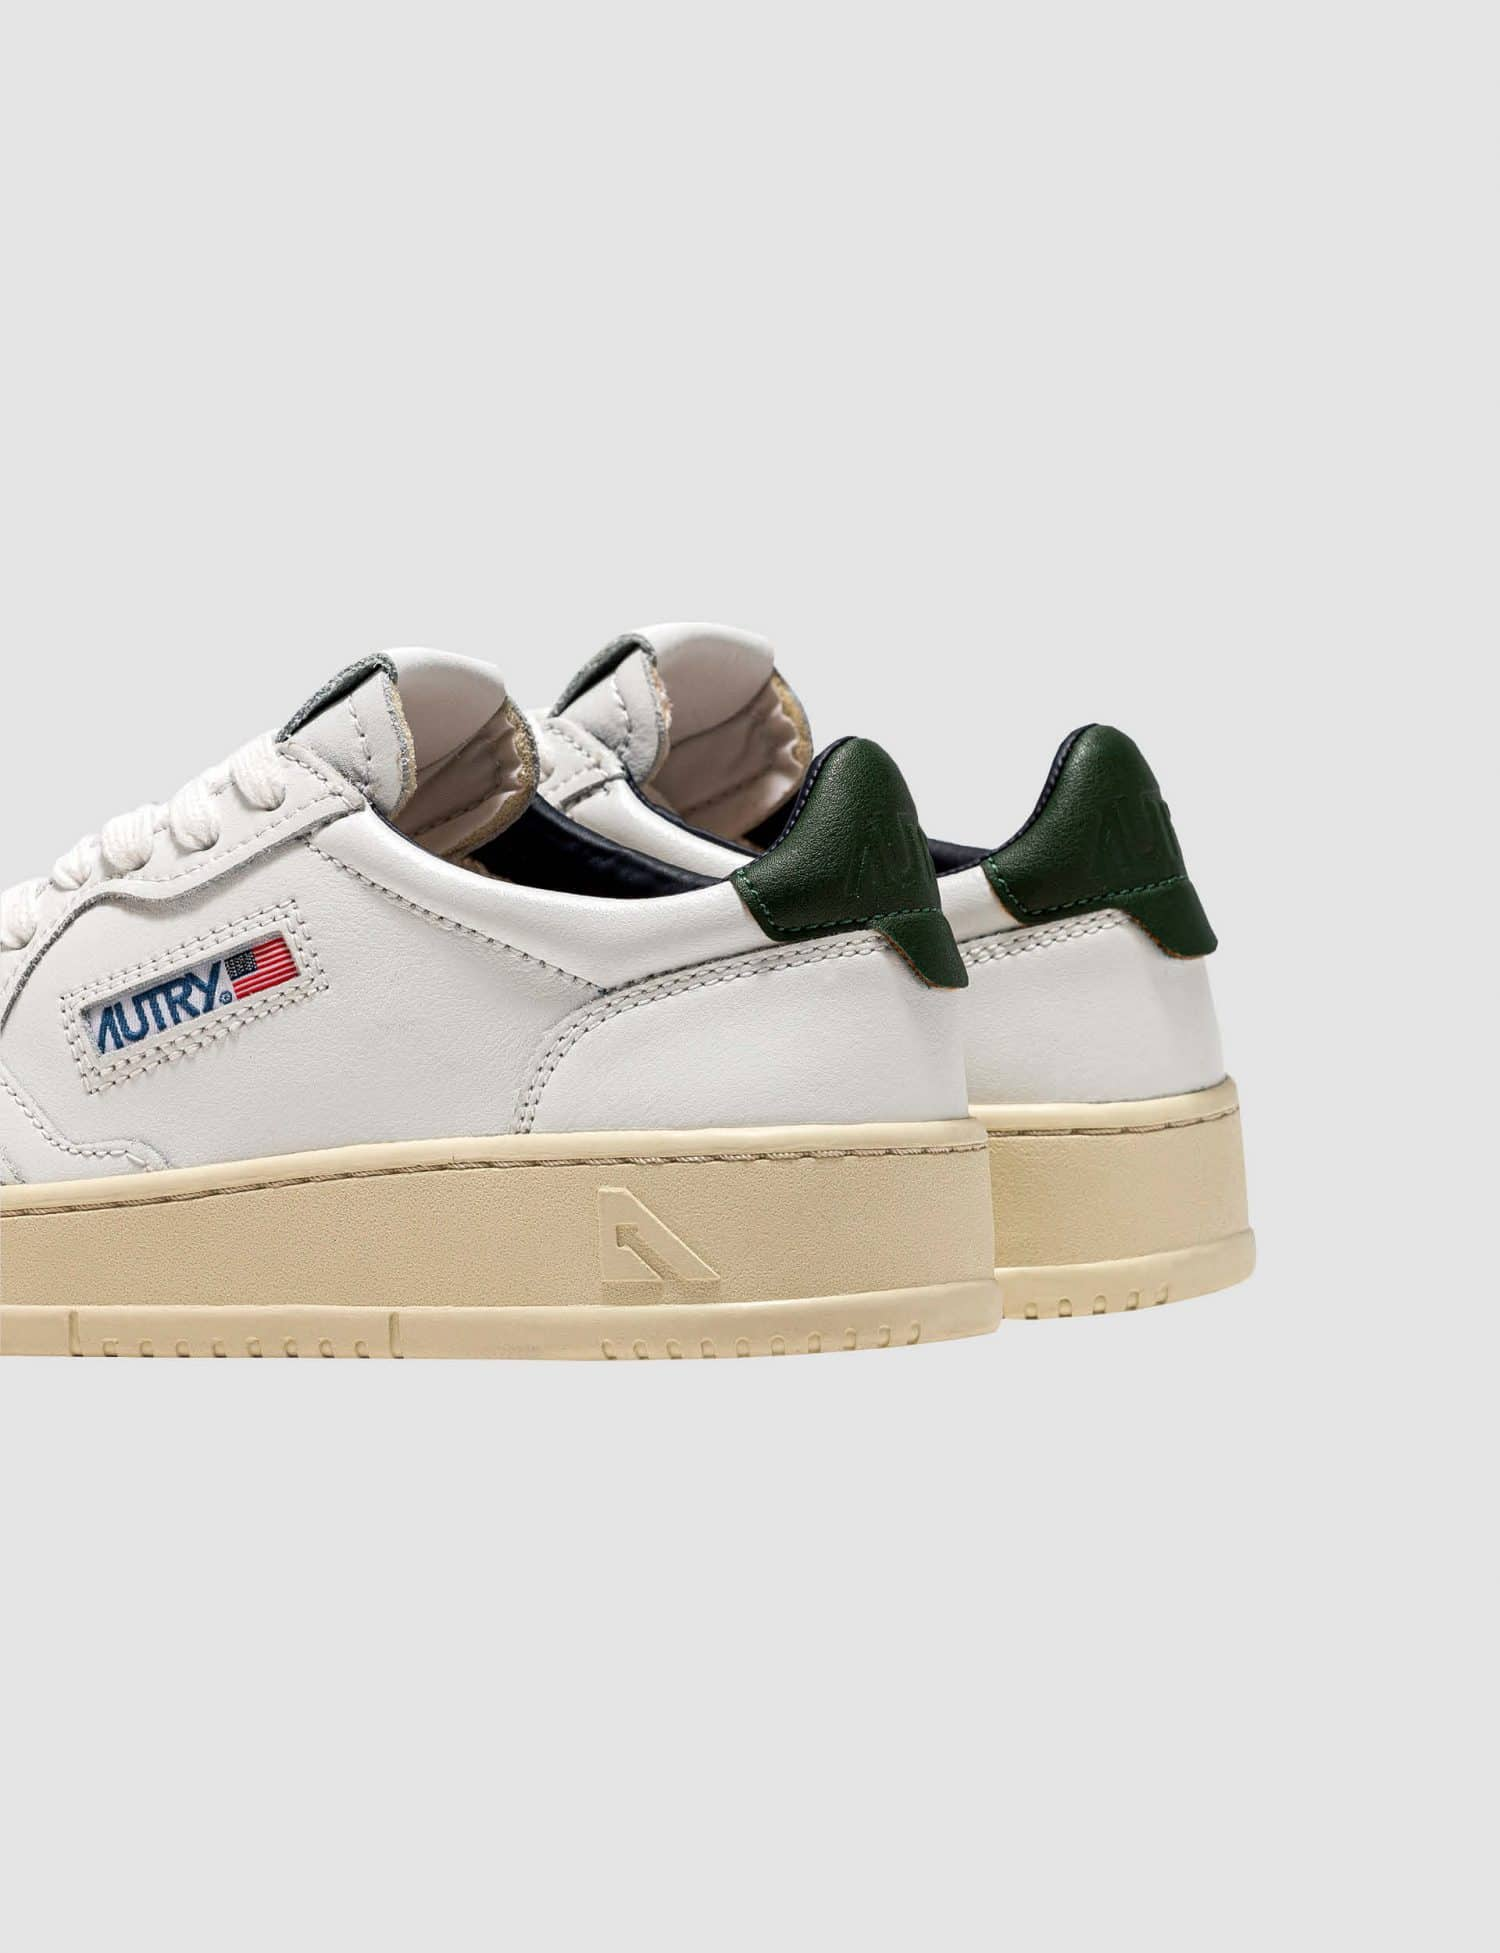 Autry - Leather Dark Green sneaker